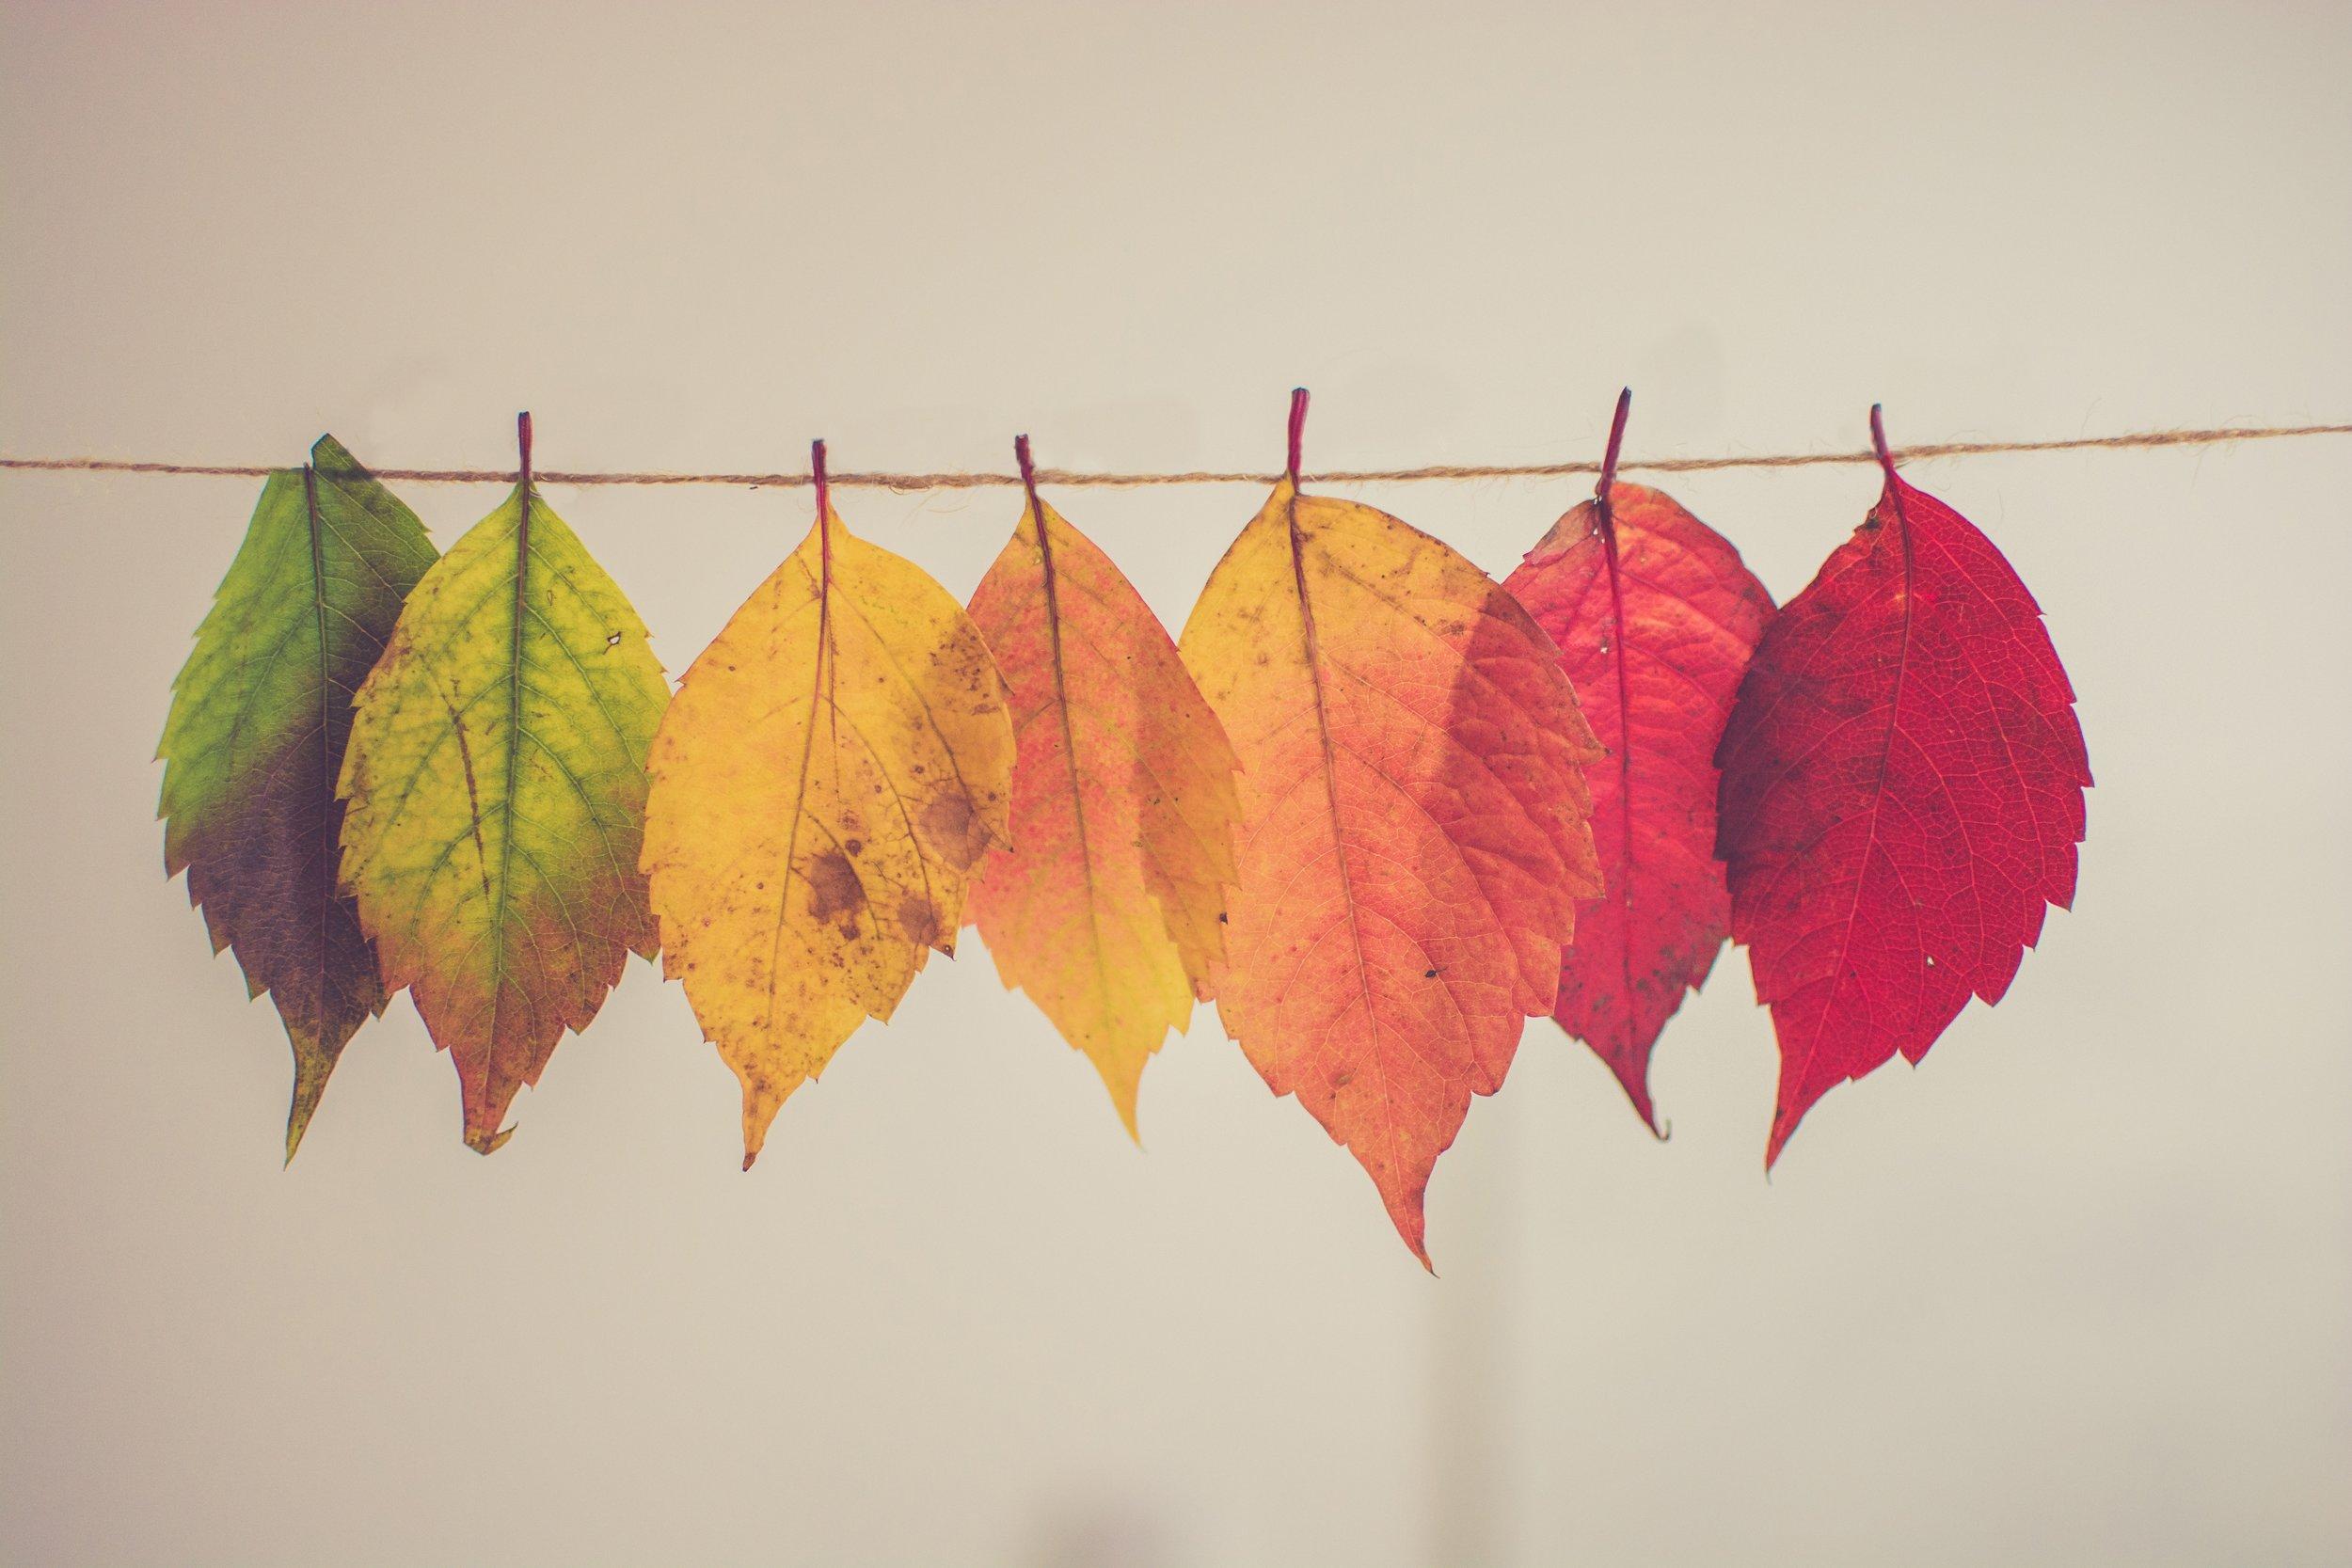 autumn_fall_leaves.jpg